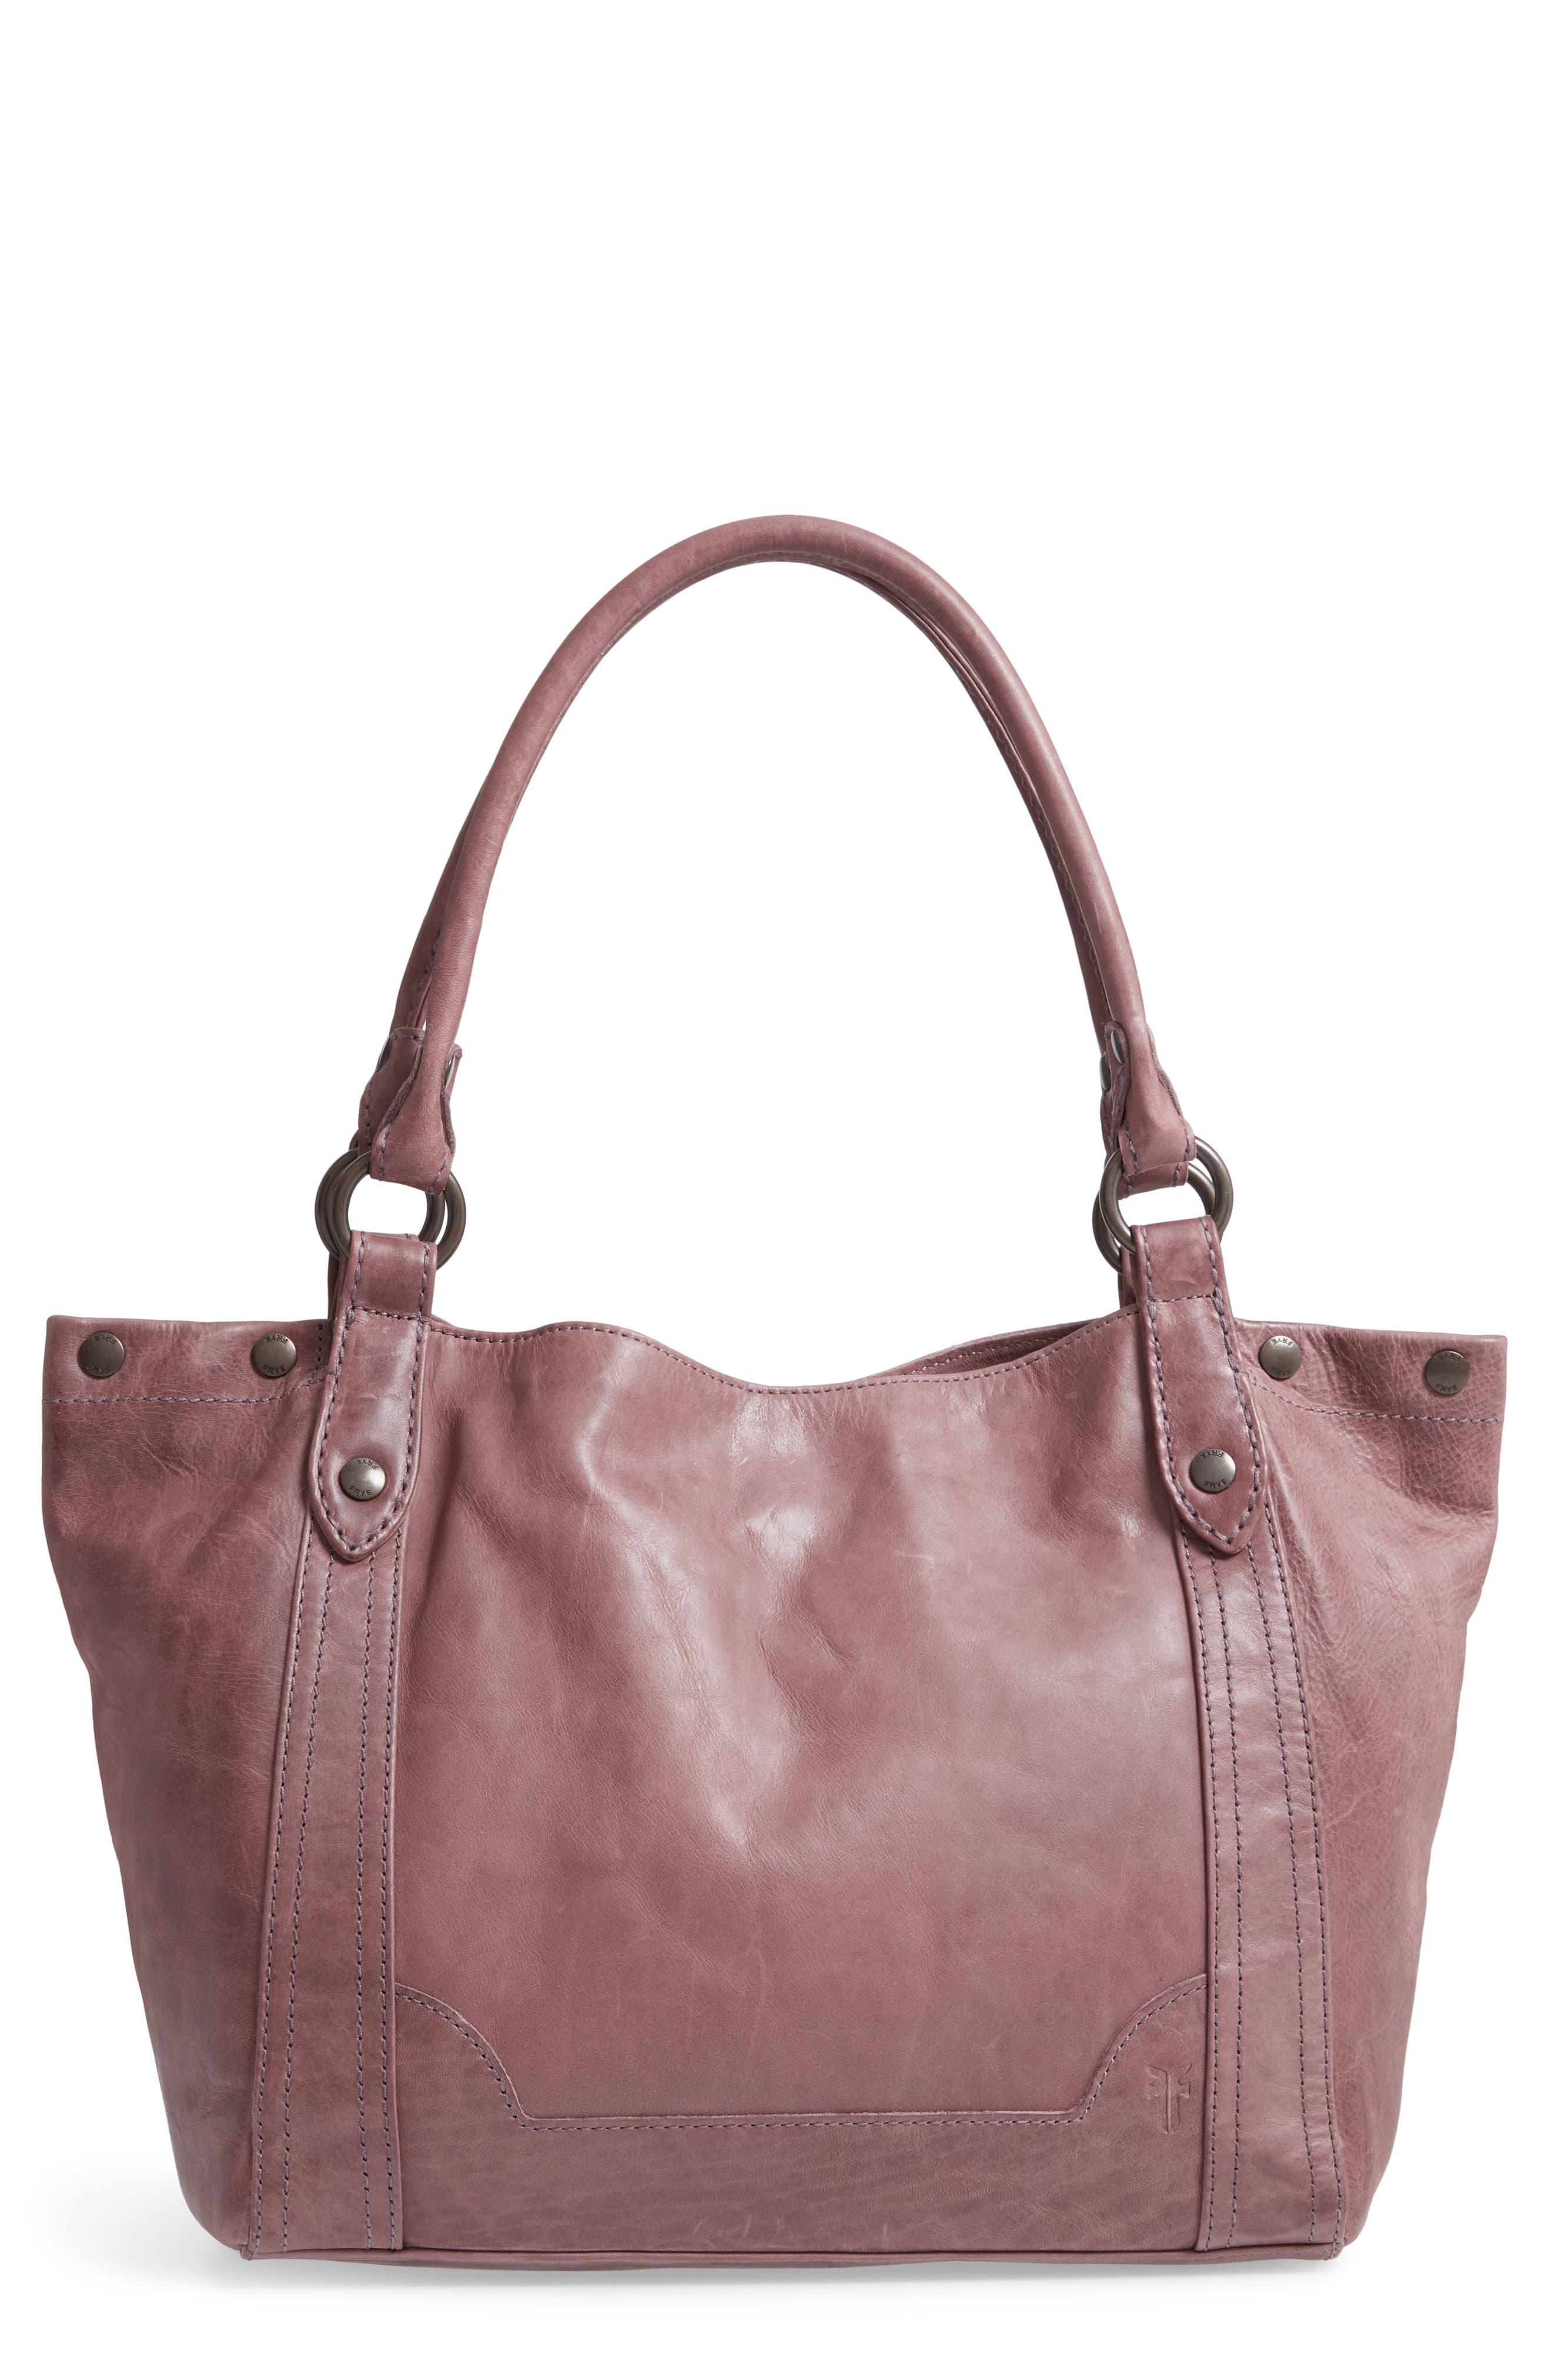 FRYE, Melissa Leather Shoulder Bag, Main thumbnail 1, color, LILAC